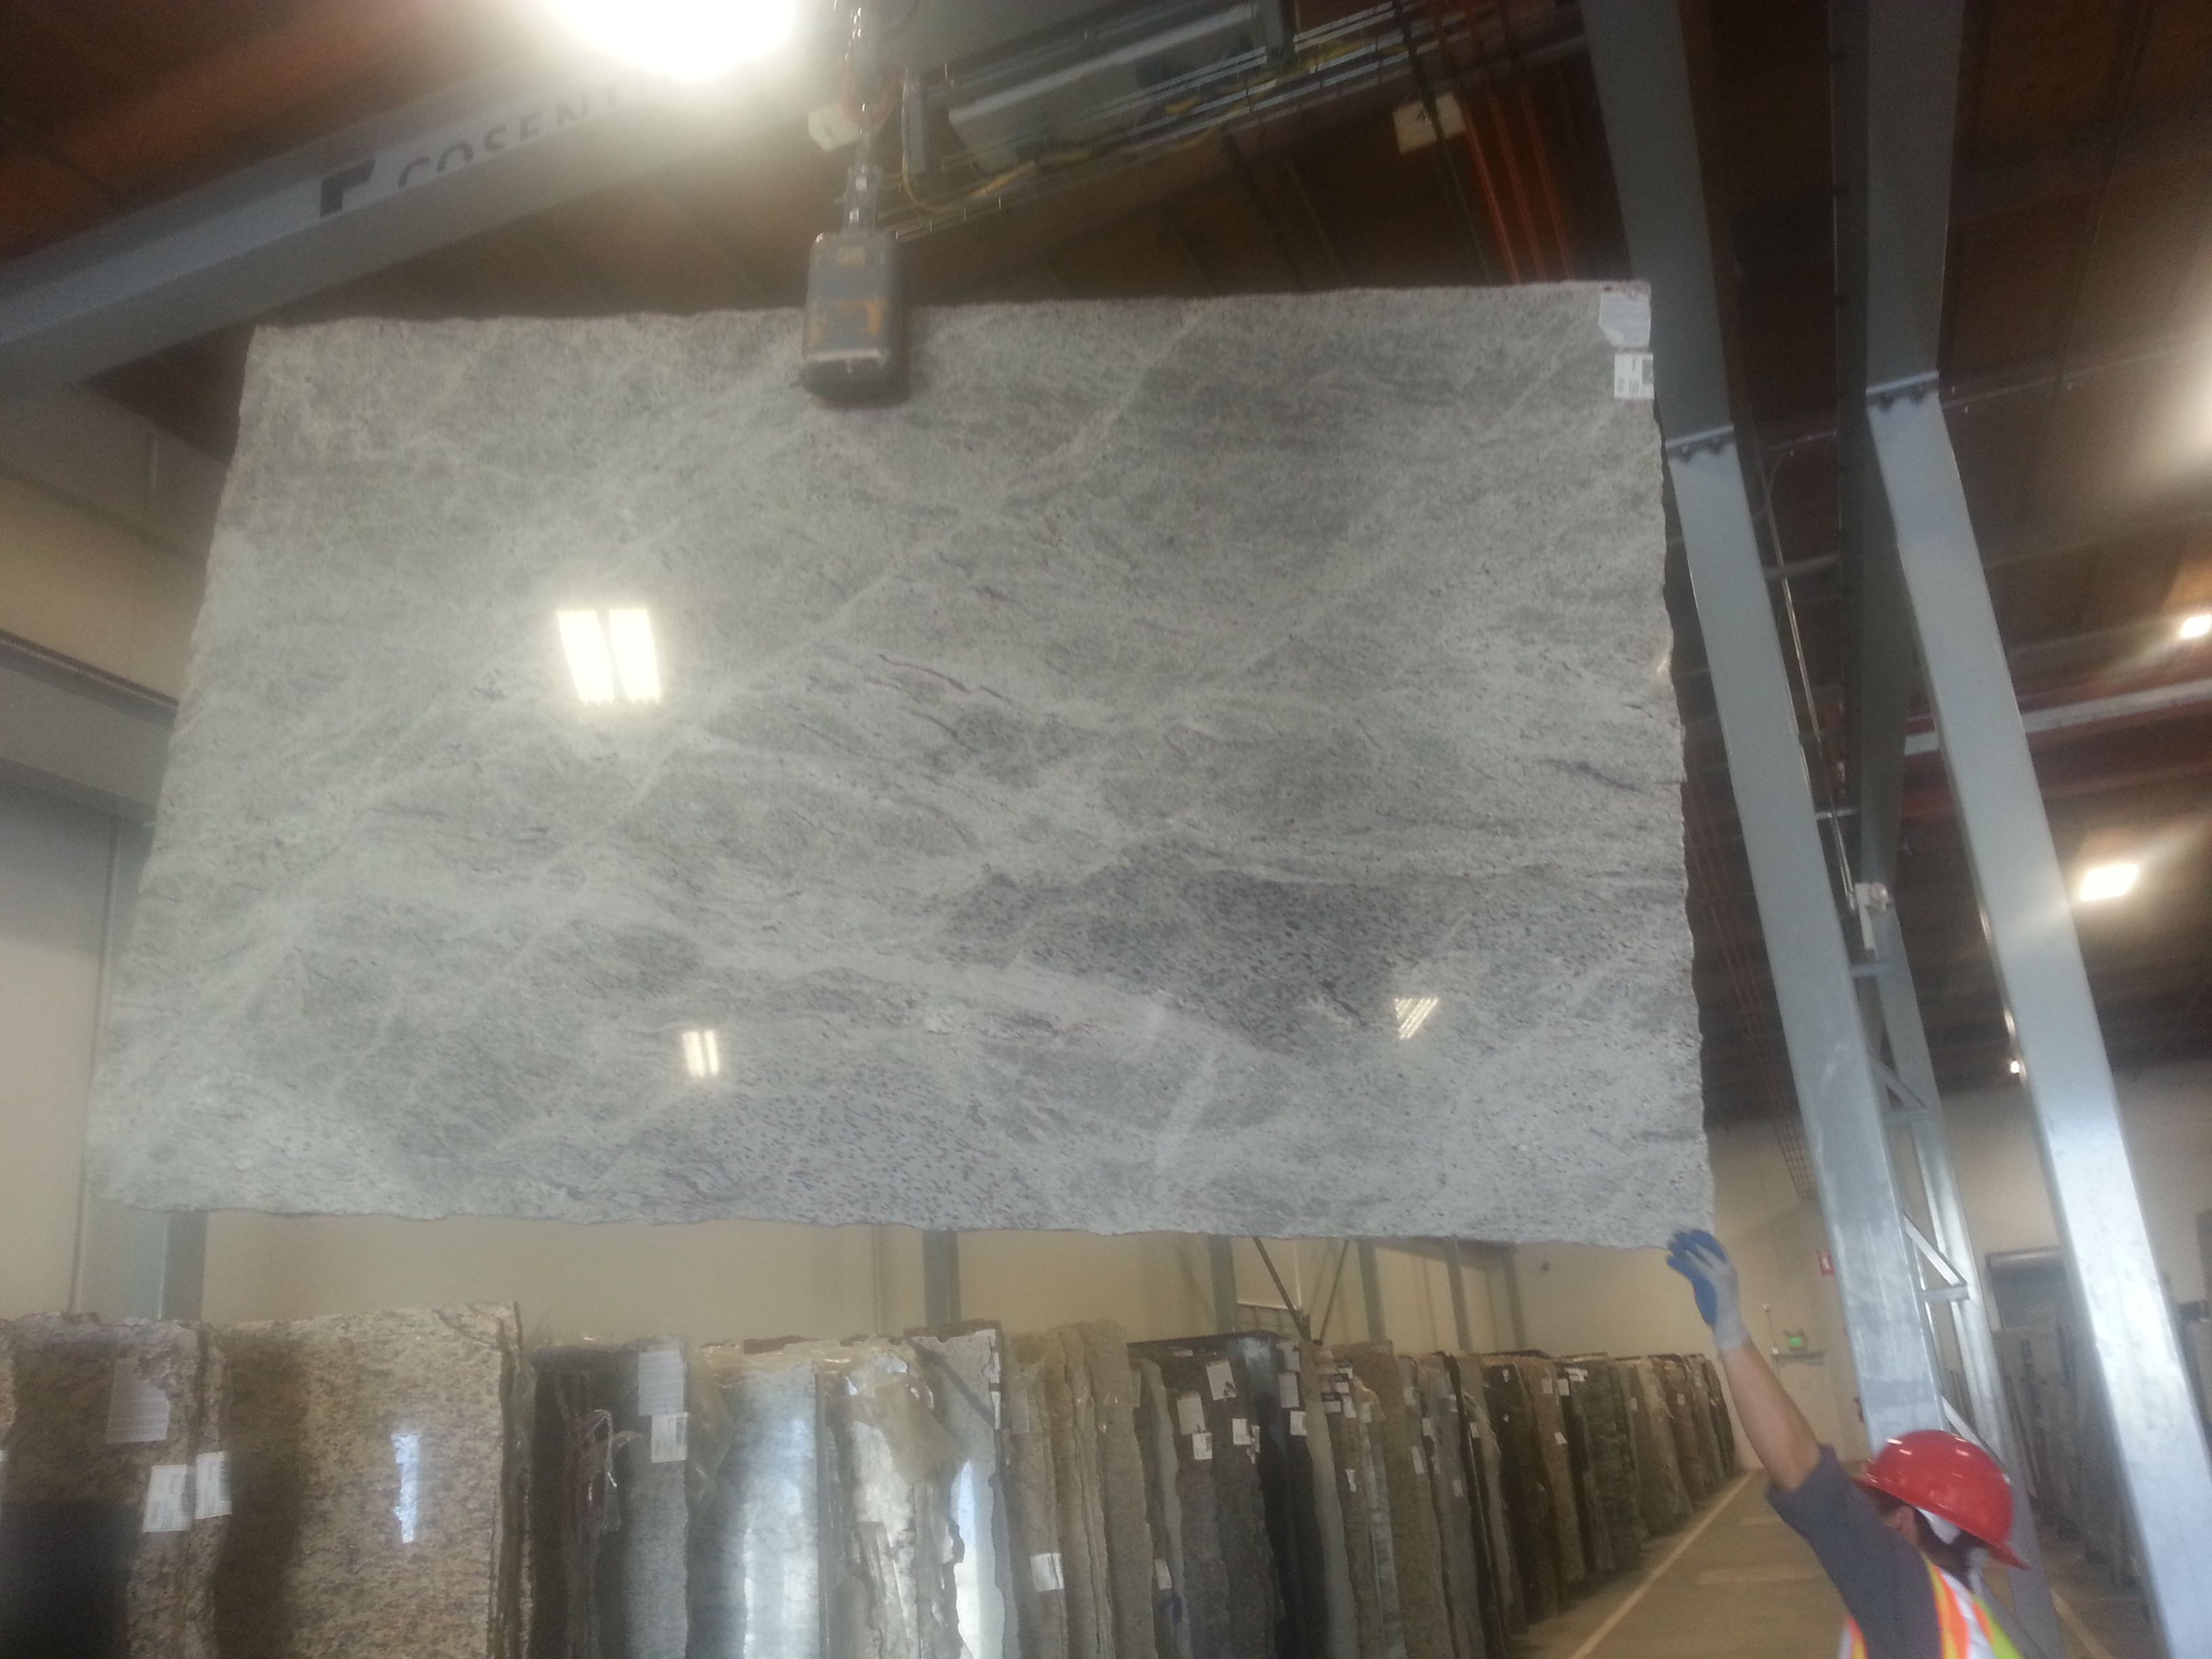 Our New Sensa Silver Silk Granite Slab To Make Our Kitchen